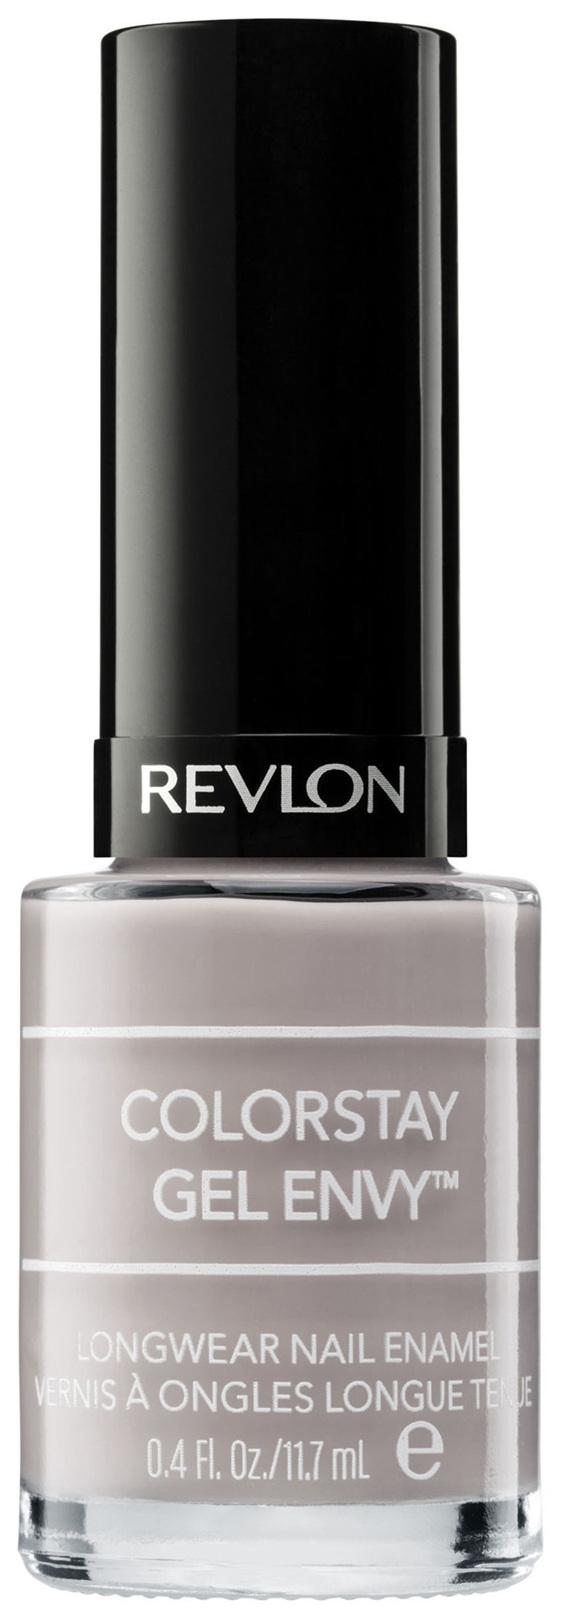 Revlon Colorstay Gel Envy™ Nail Enamel Checkmate